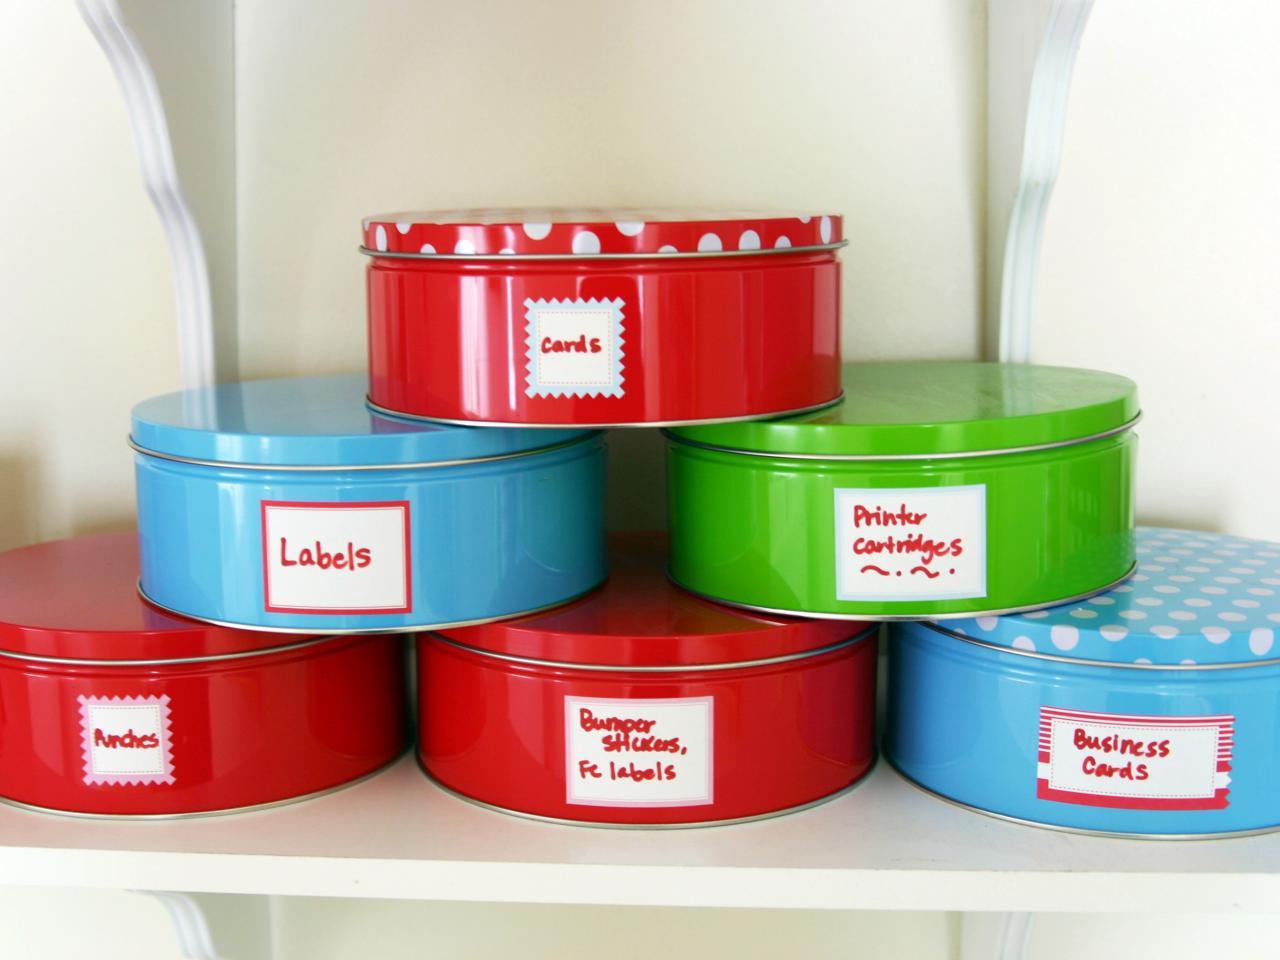 Office Organization Tips 5 quick tips for home office organization | hgtv